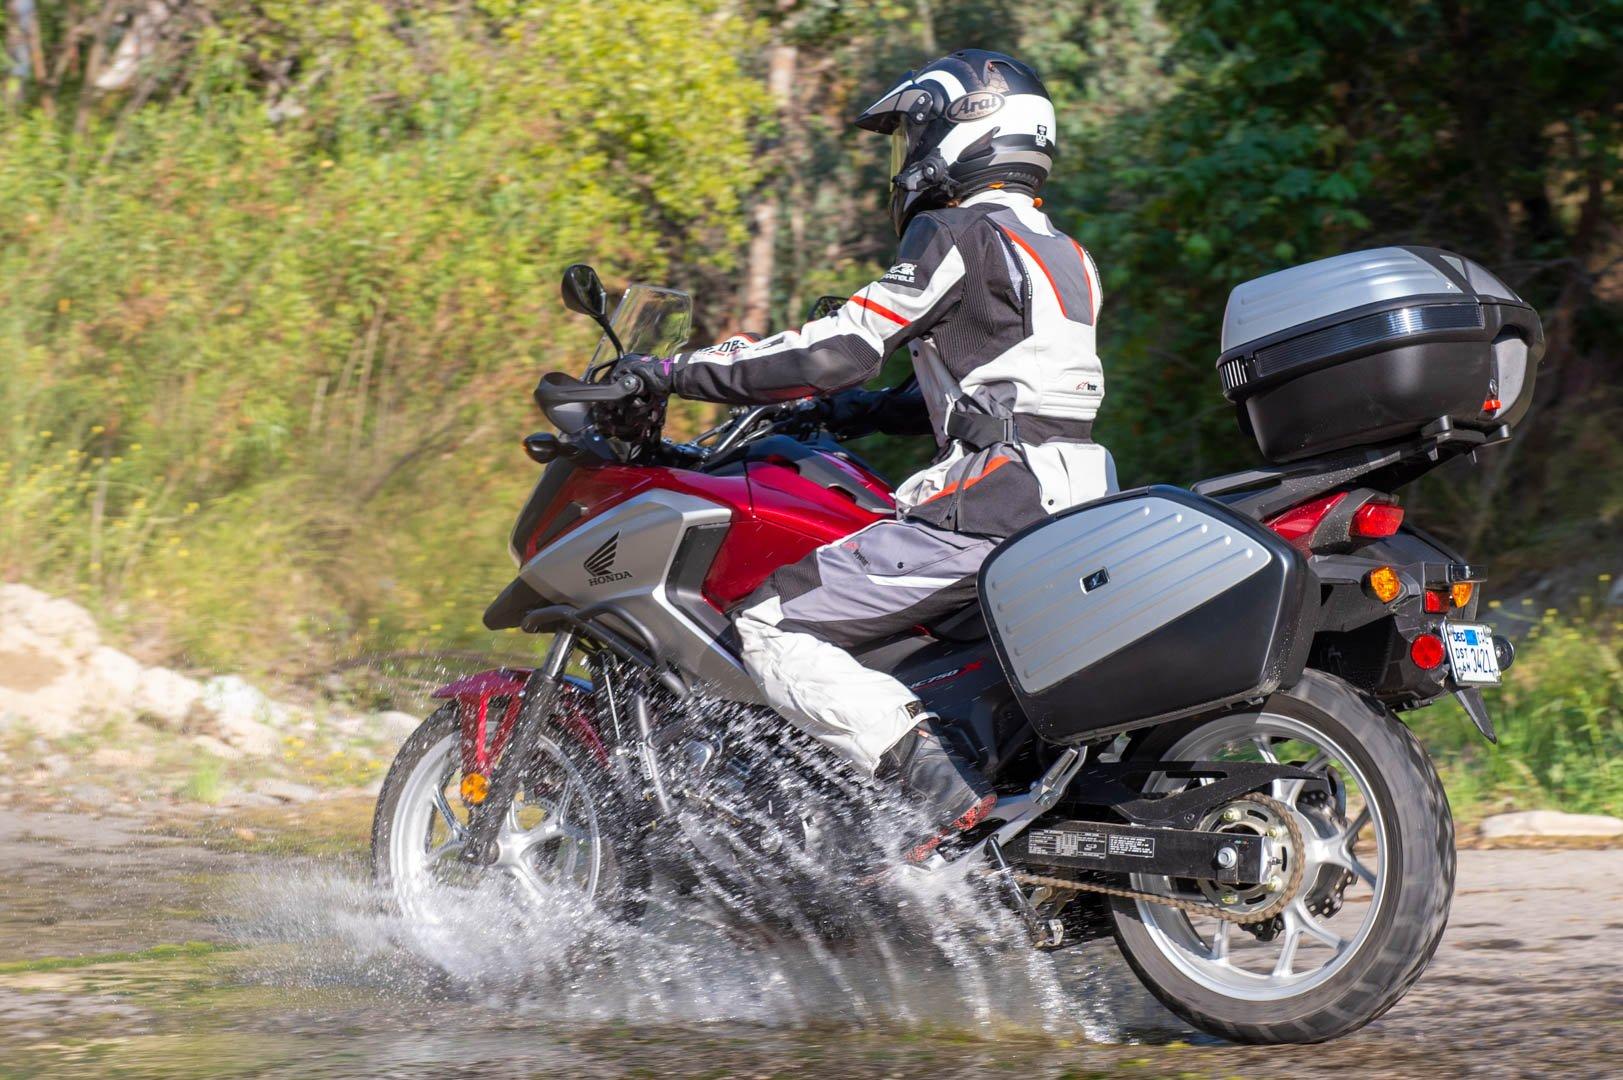 Honda NC750X DCT ABS review